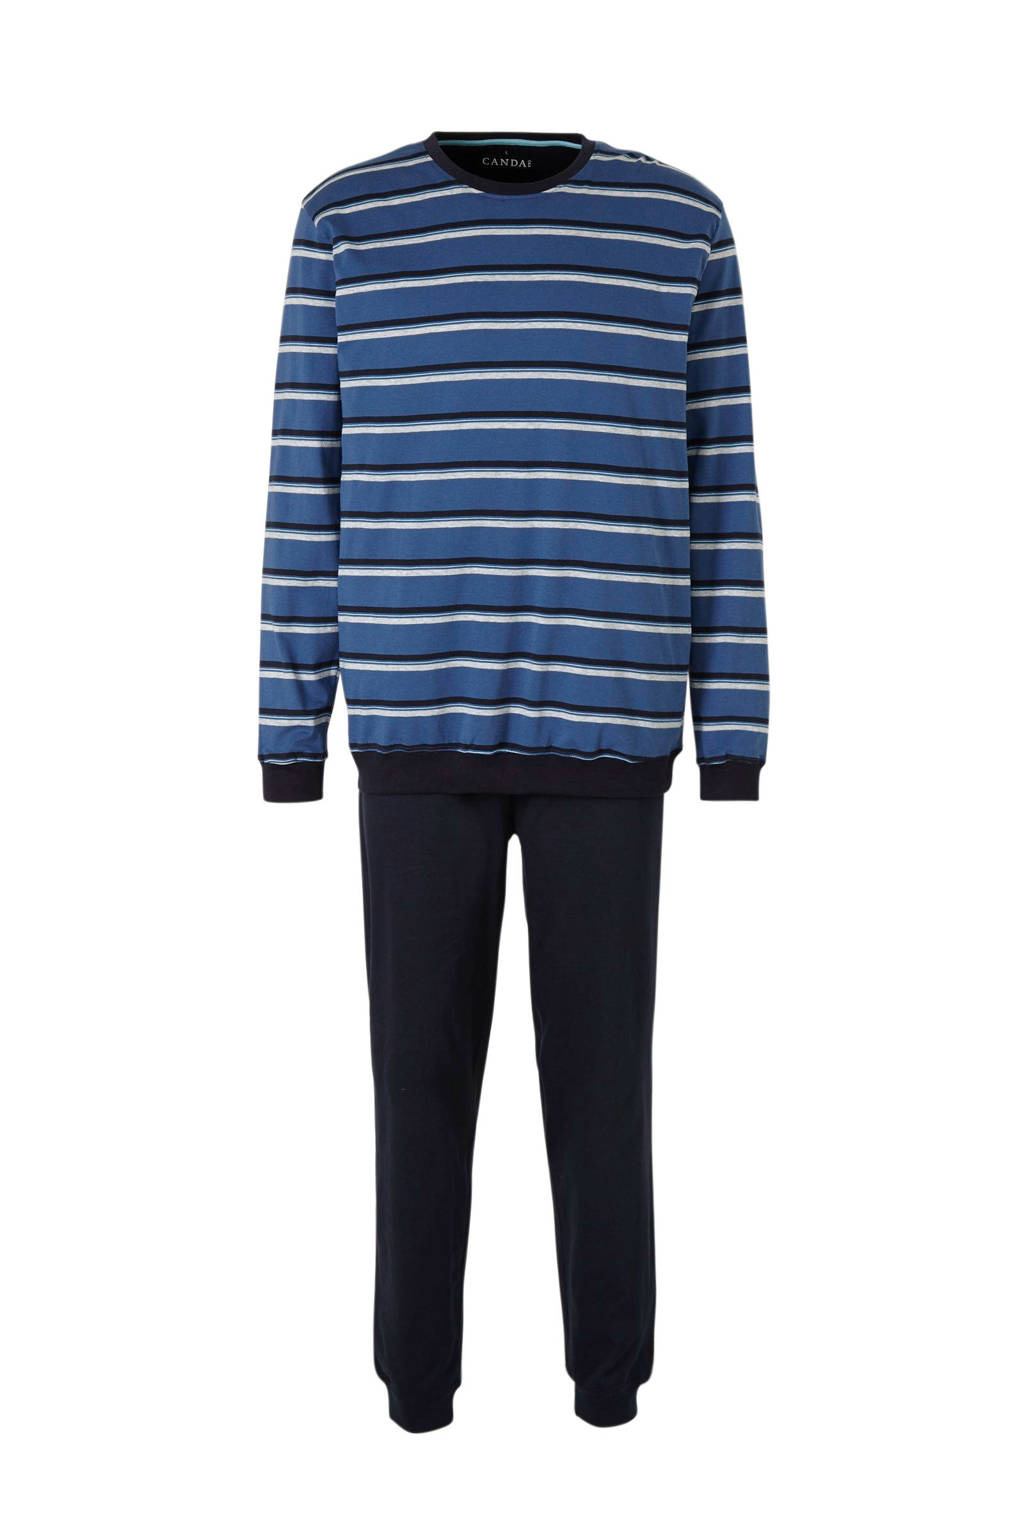 C&A Canda pyjama met streep blauw, Blauw/marine